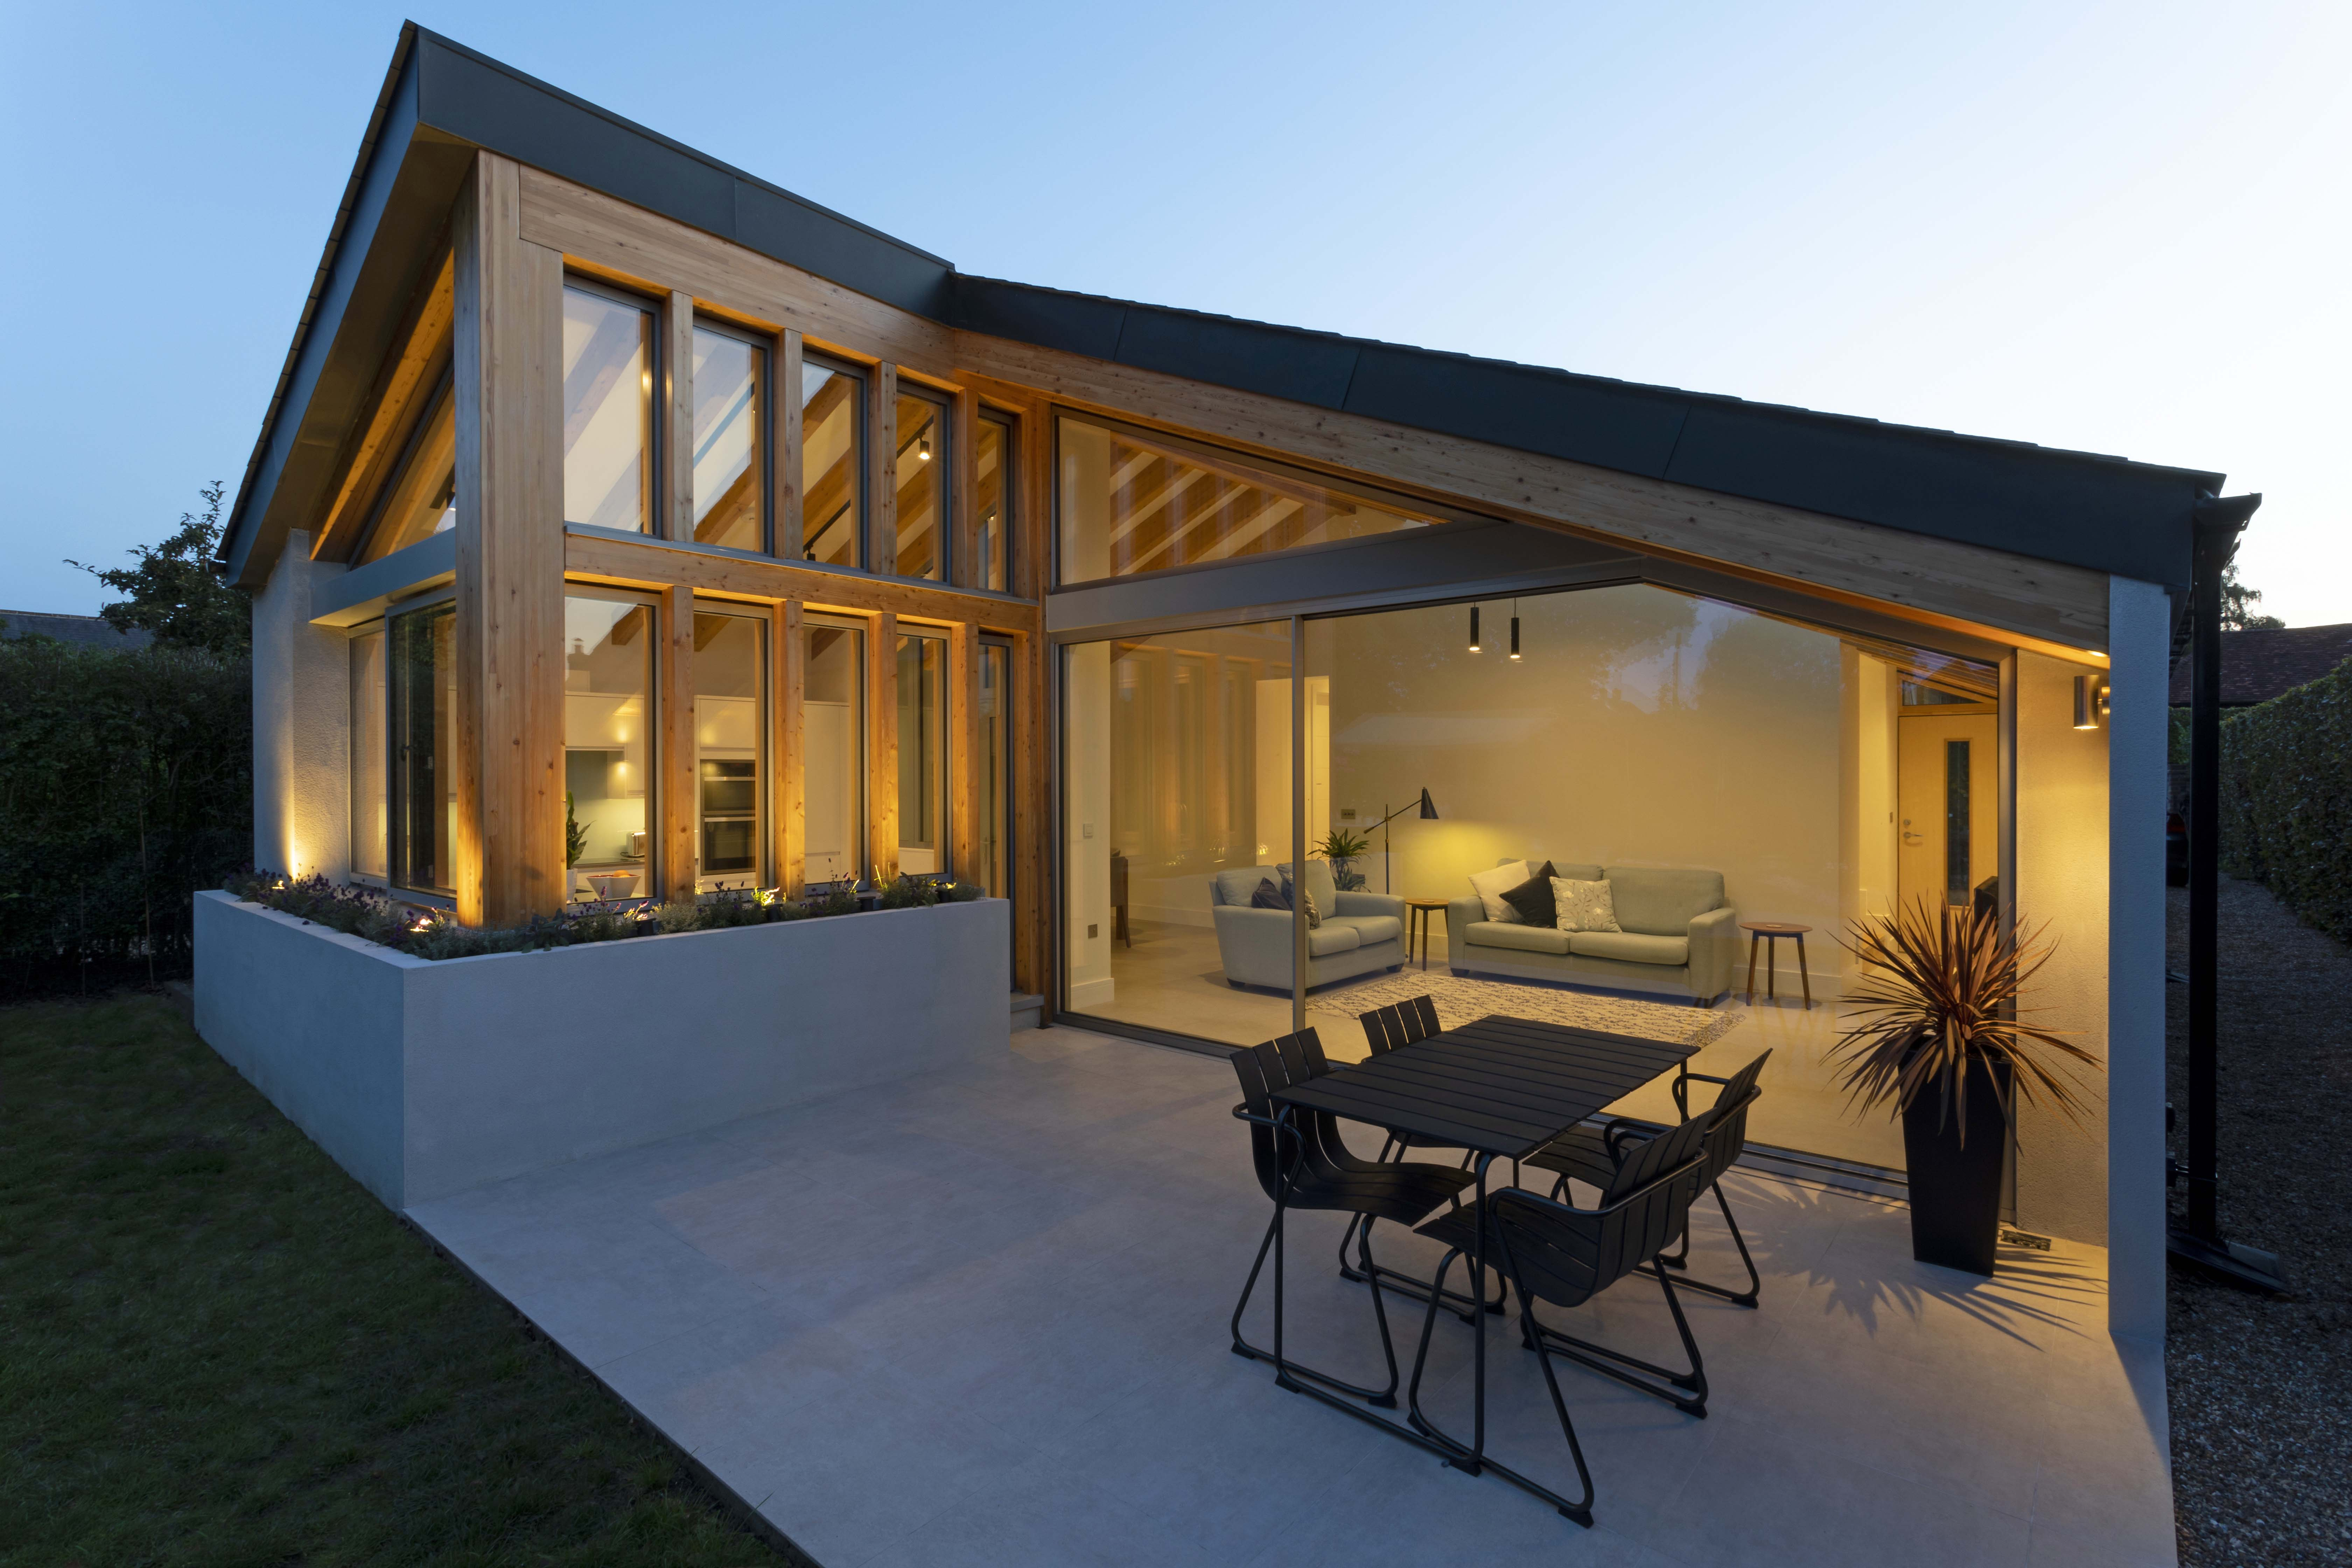 Scandinavian architecture, bungalow, surrey home, house, property, design